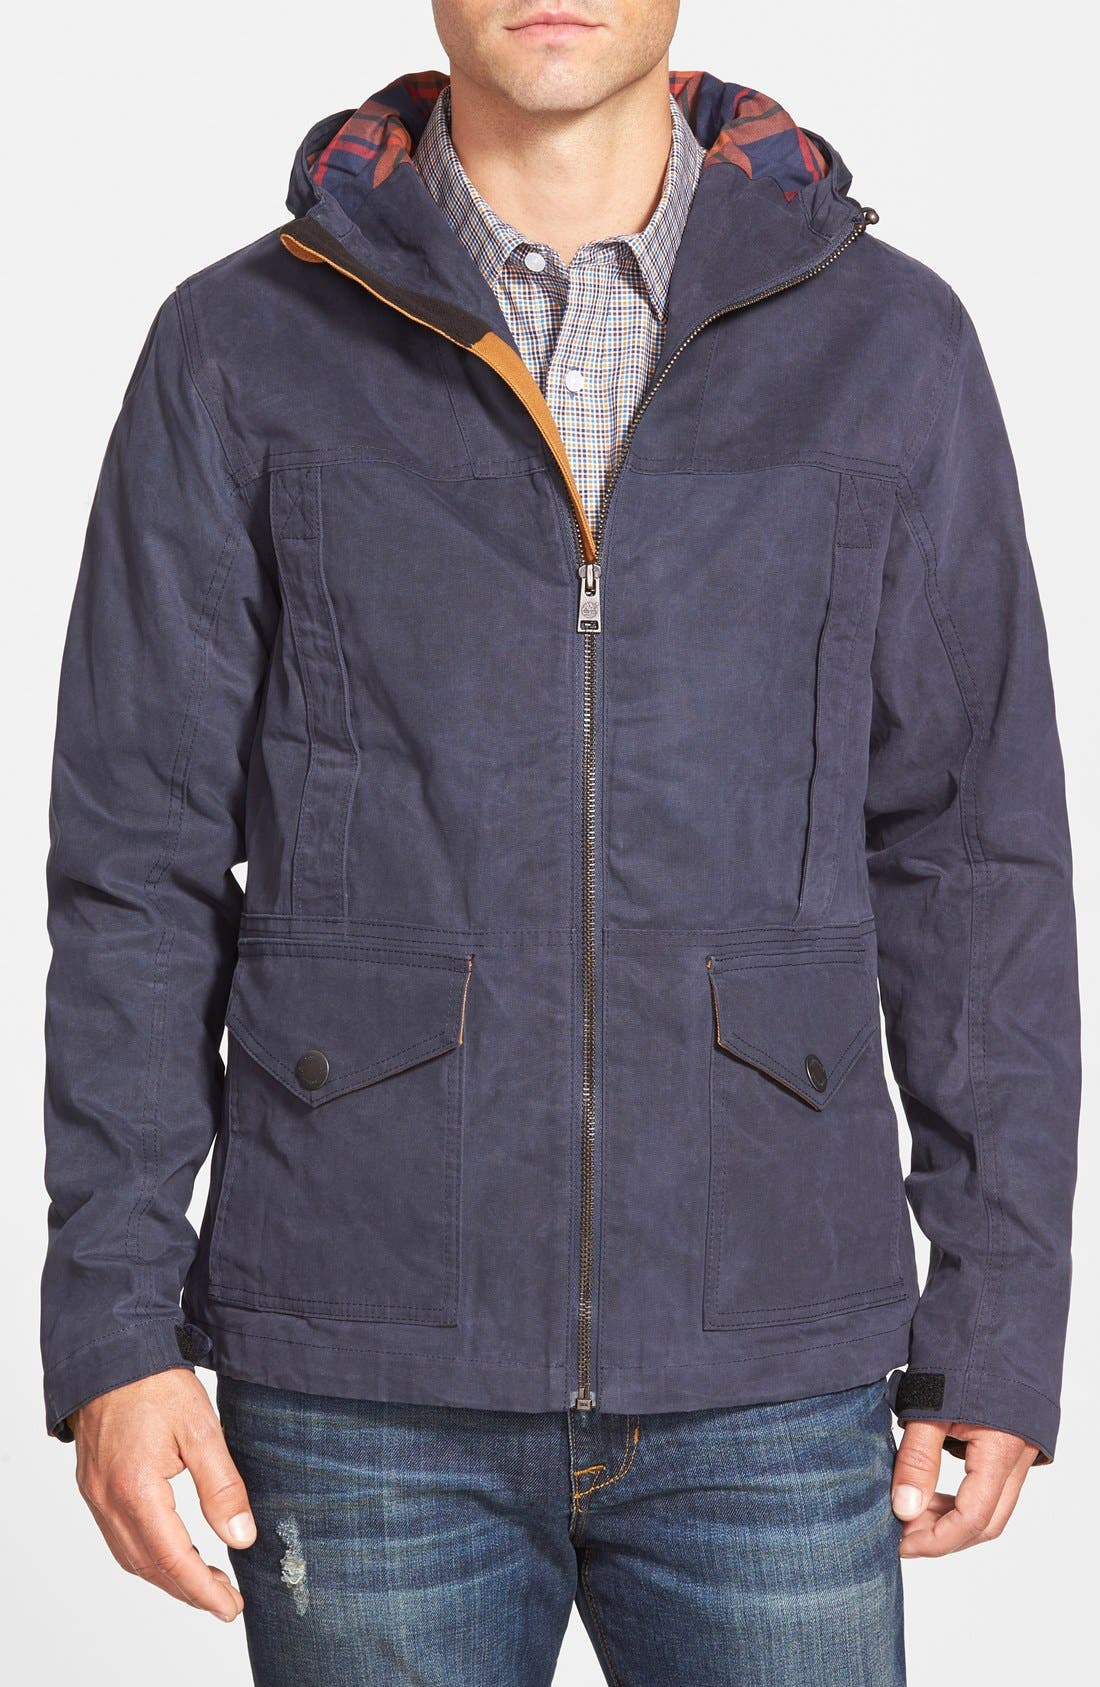 Main Image - Timberland 'Mount Davis' Waxed Cotton Hooded Jacket